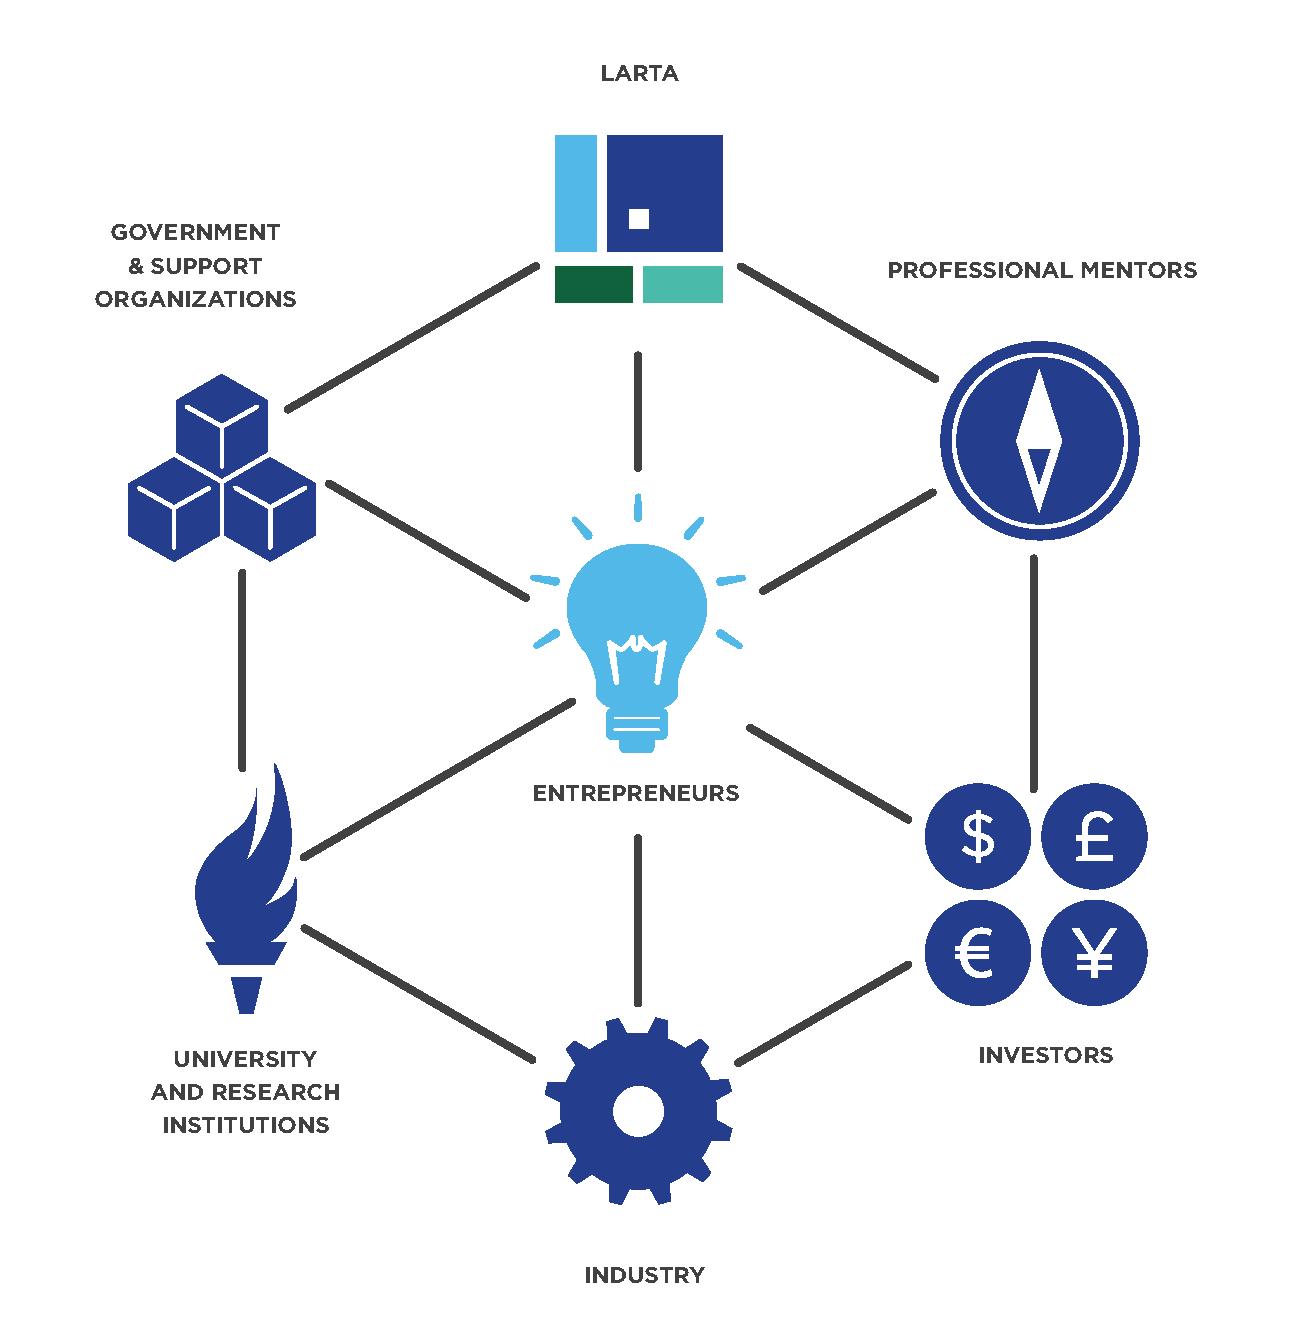 Network Centric Model 2016 - THE LARTA FACTOR